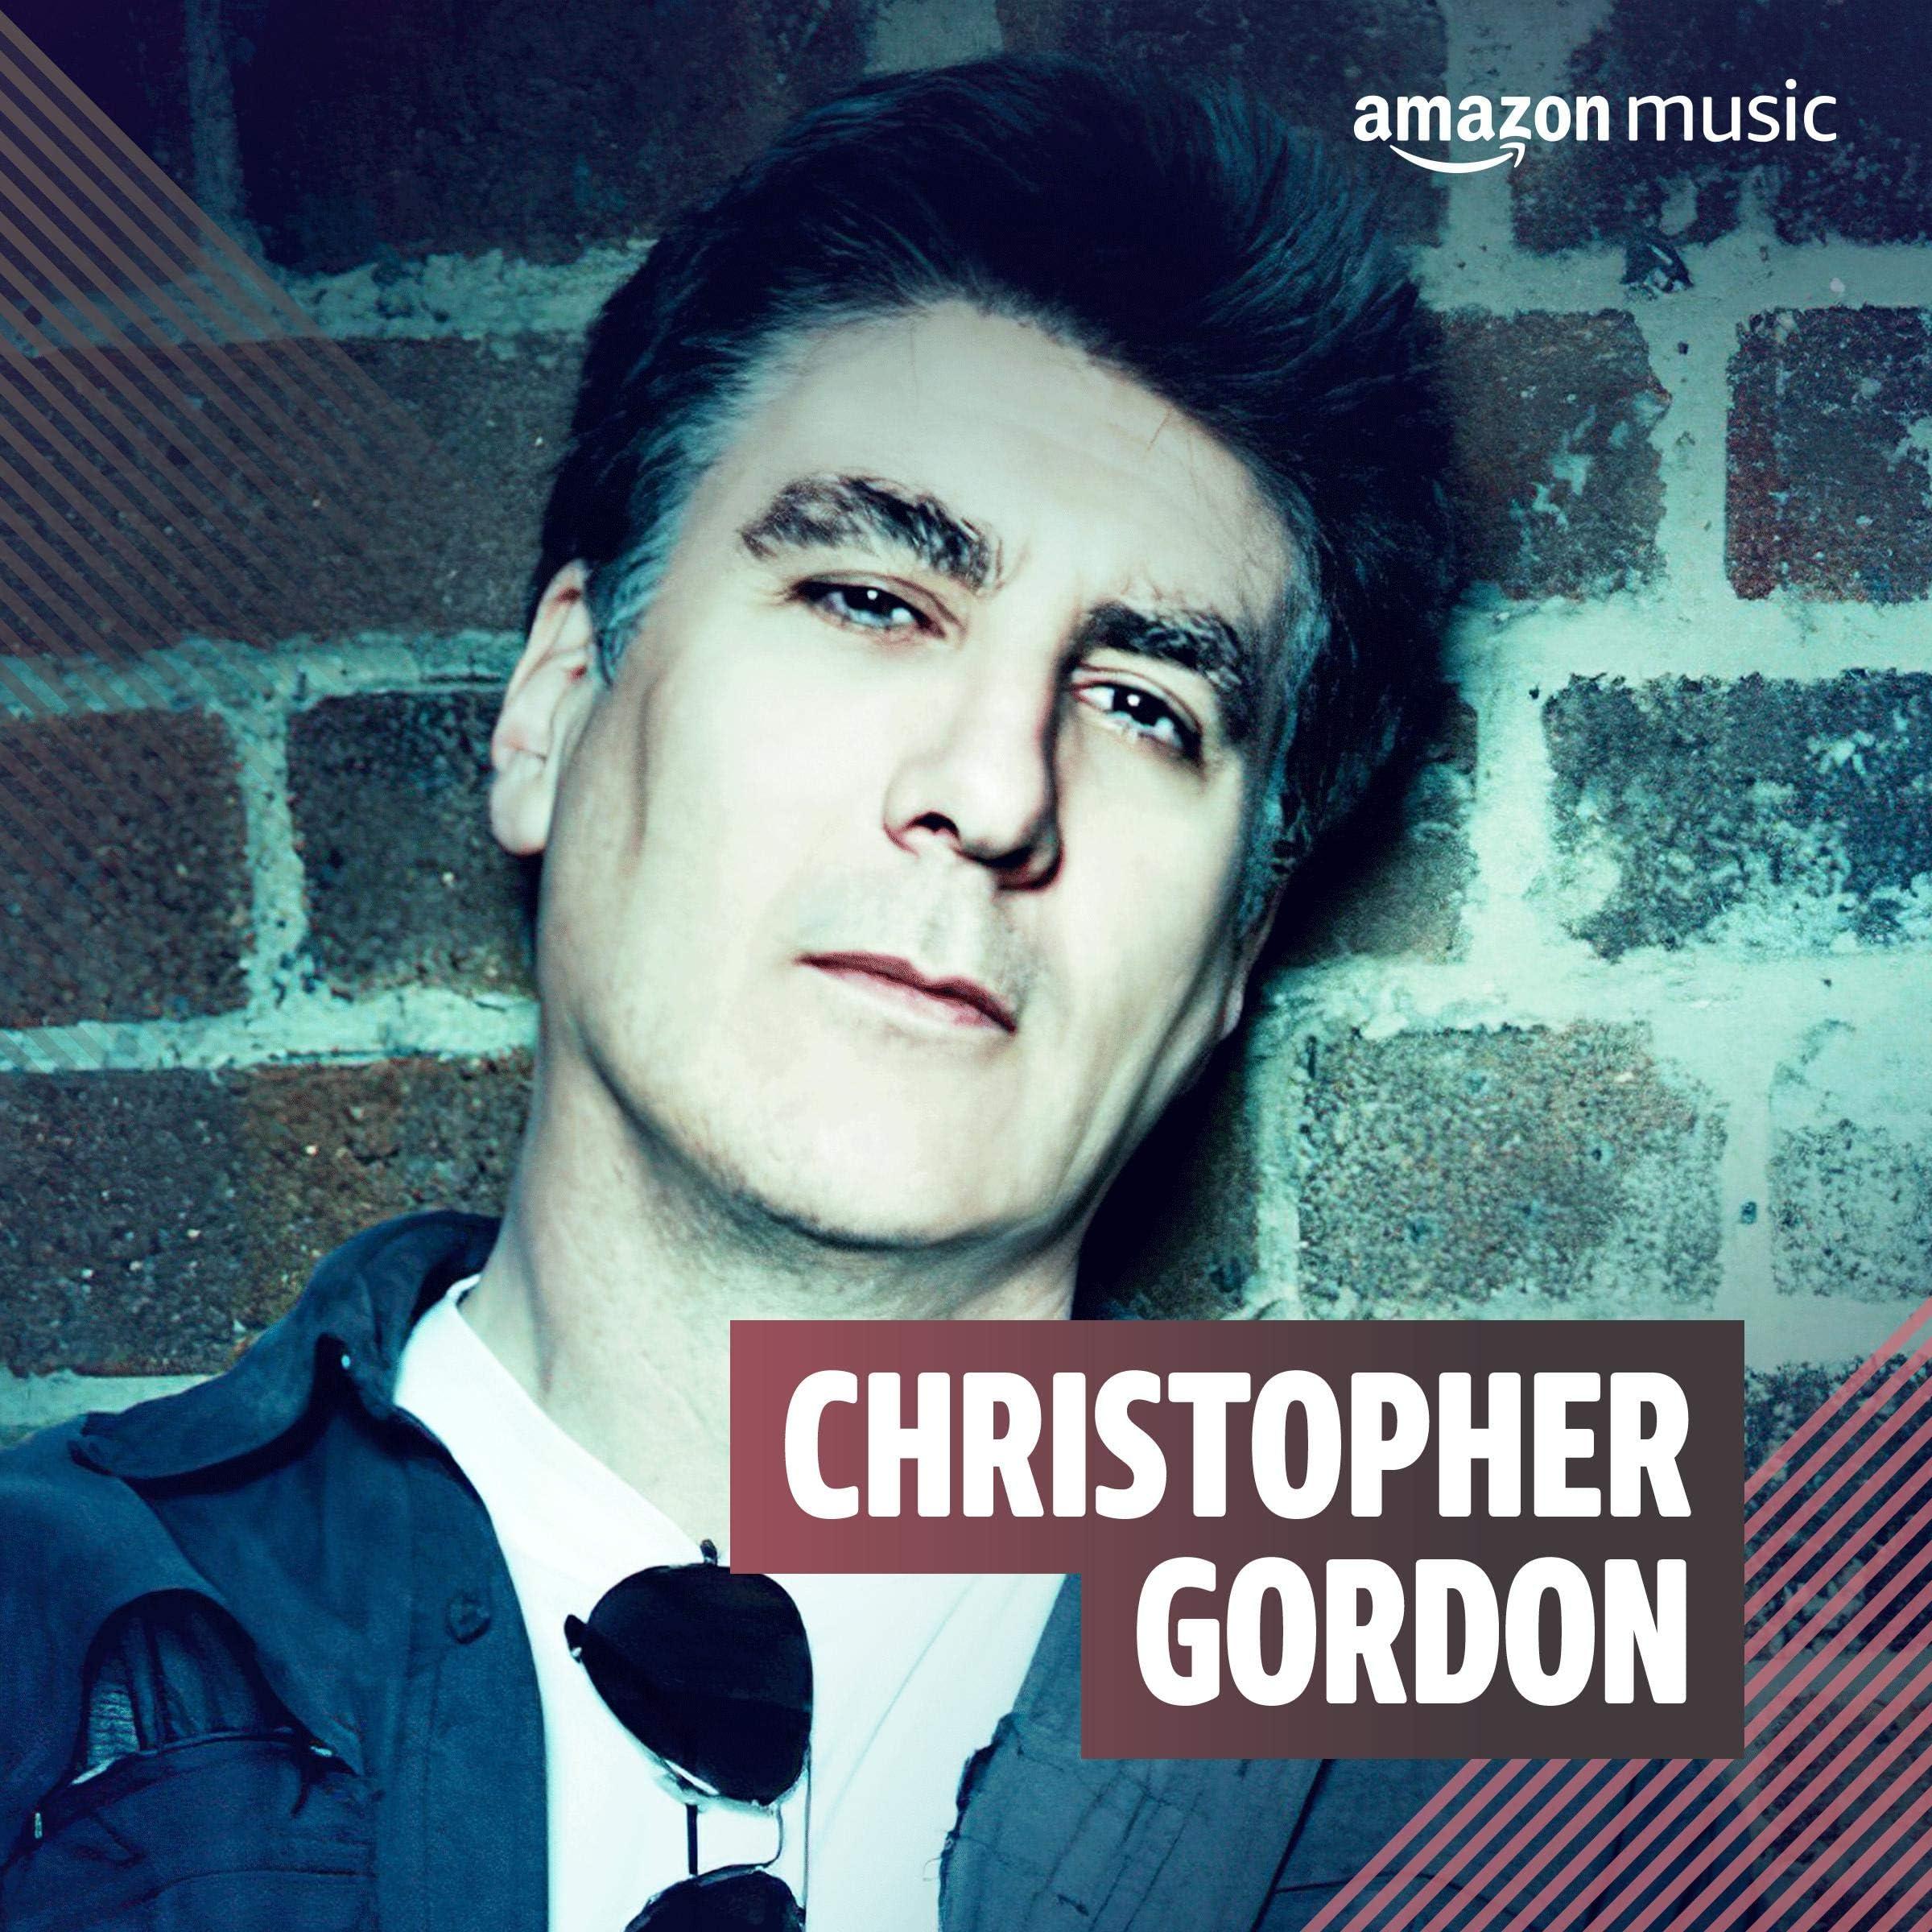 Christopher Gordon